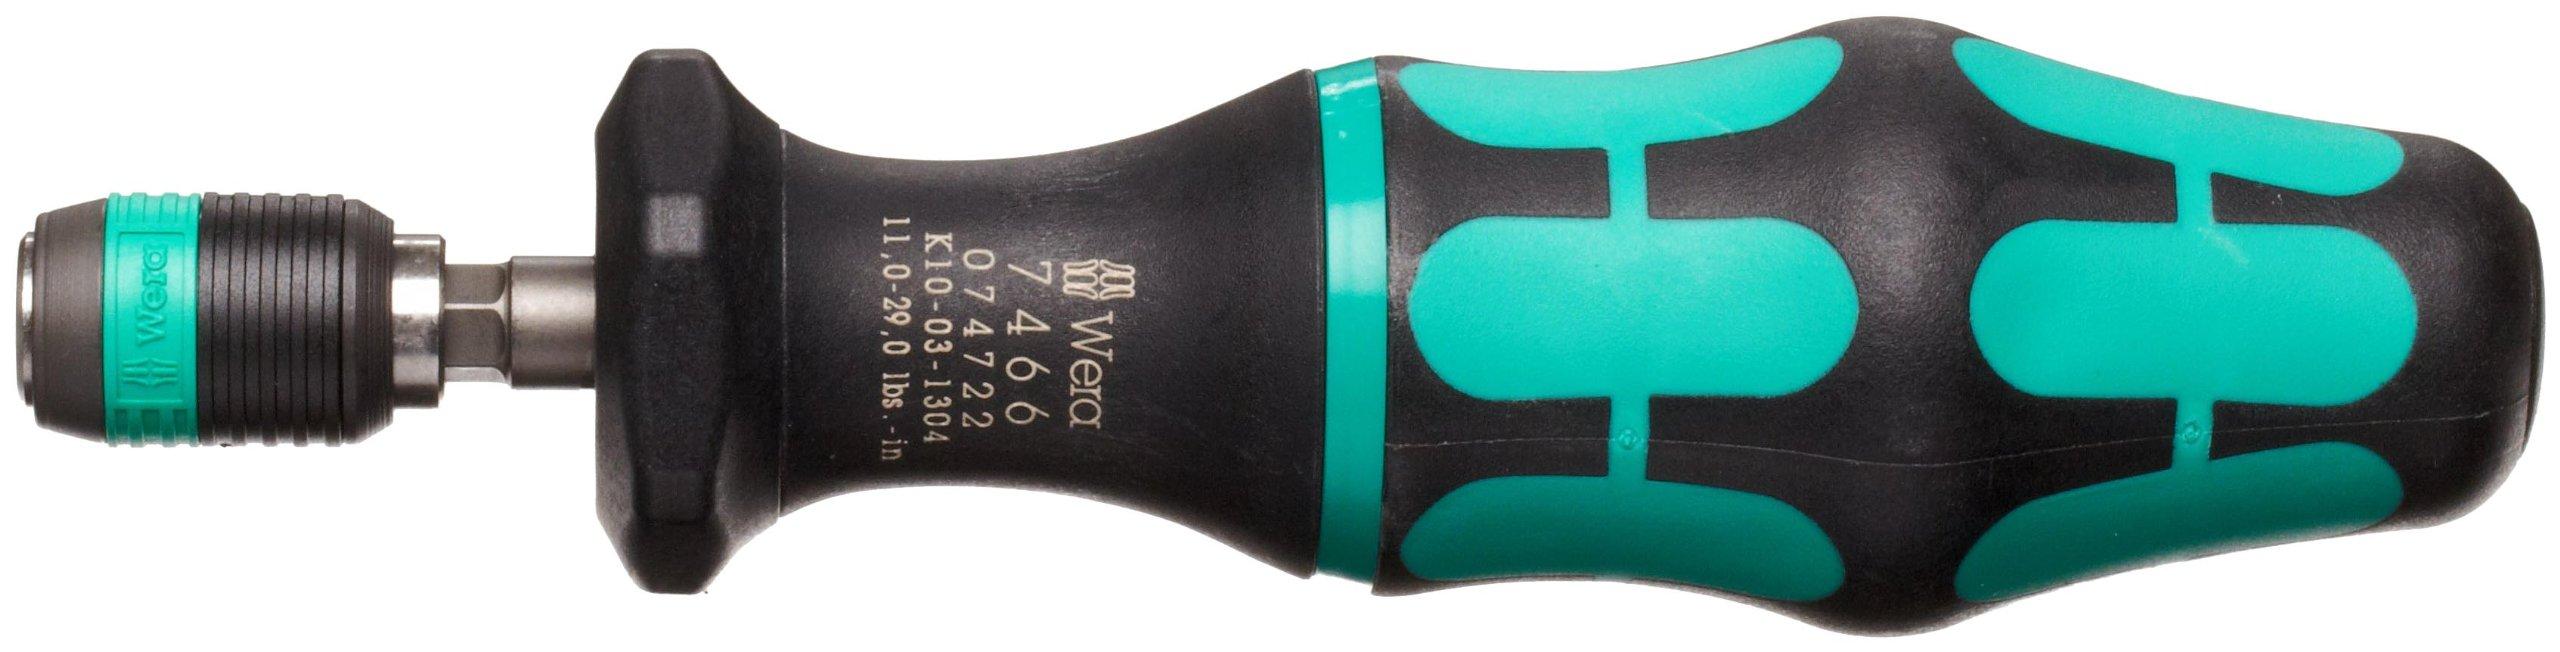 Wera 05074722001 Kraftform 7466 Hexagon Torque Screwdriver, 1/4'' Head, 11.0-29.0''/lbs Pre-Set Adjustable Torque Range